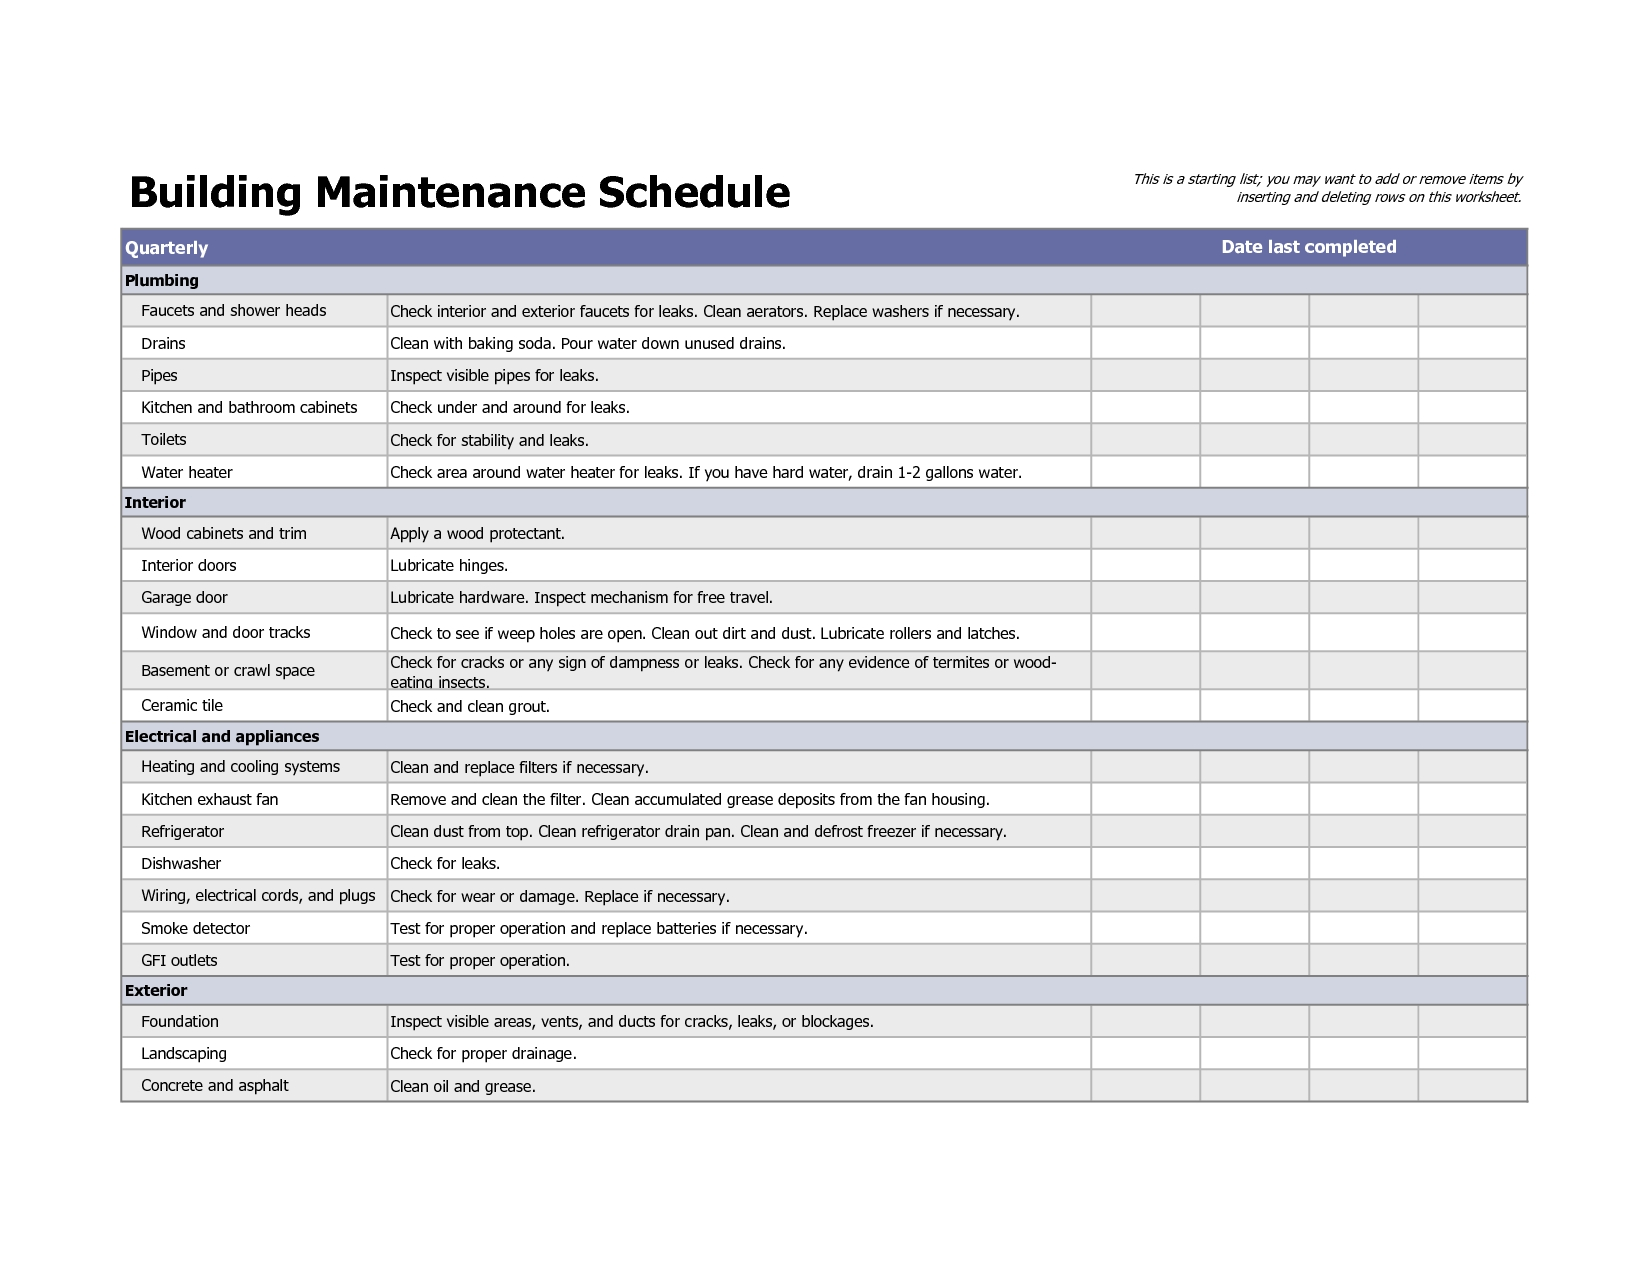 Building Maintenance Schedule Excel Template Printable